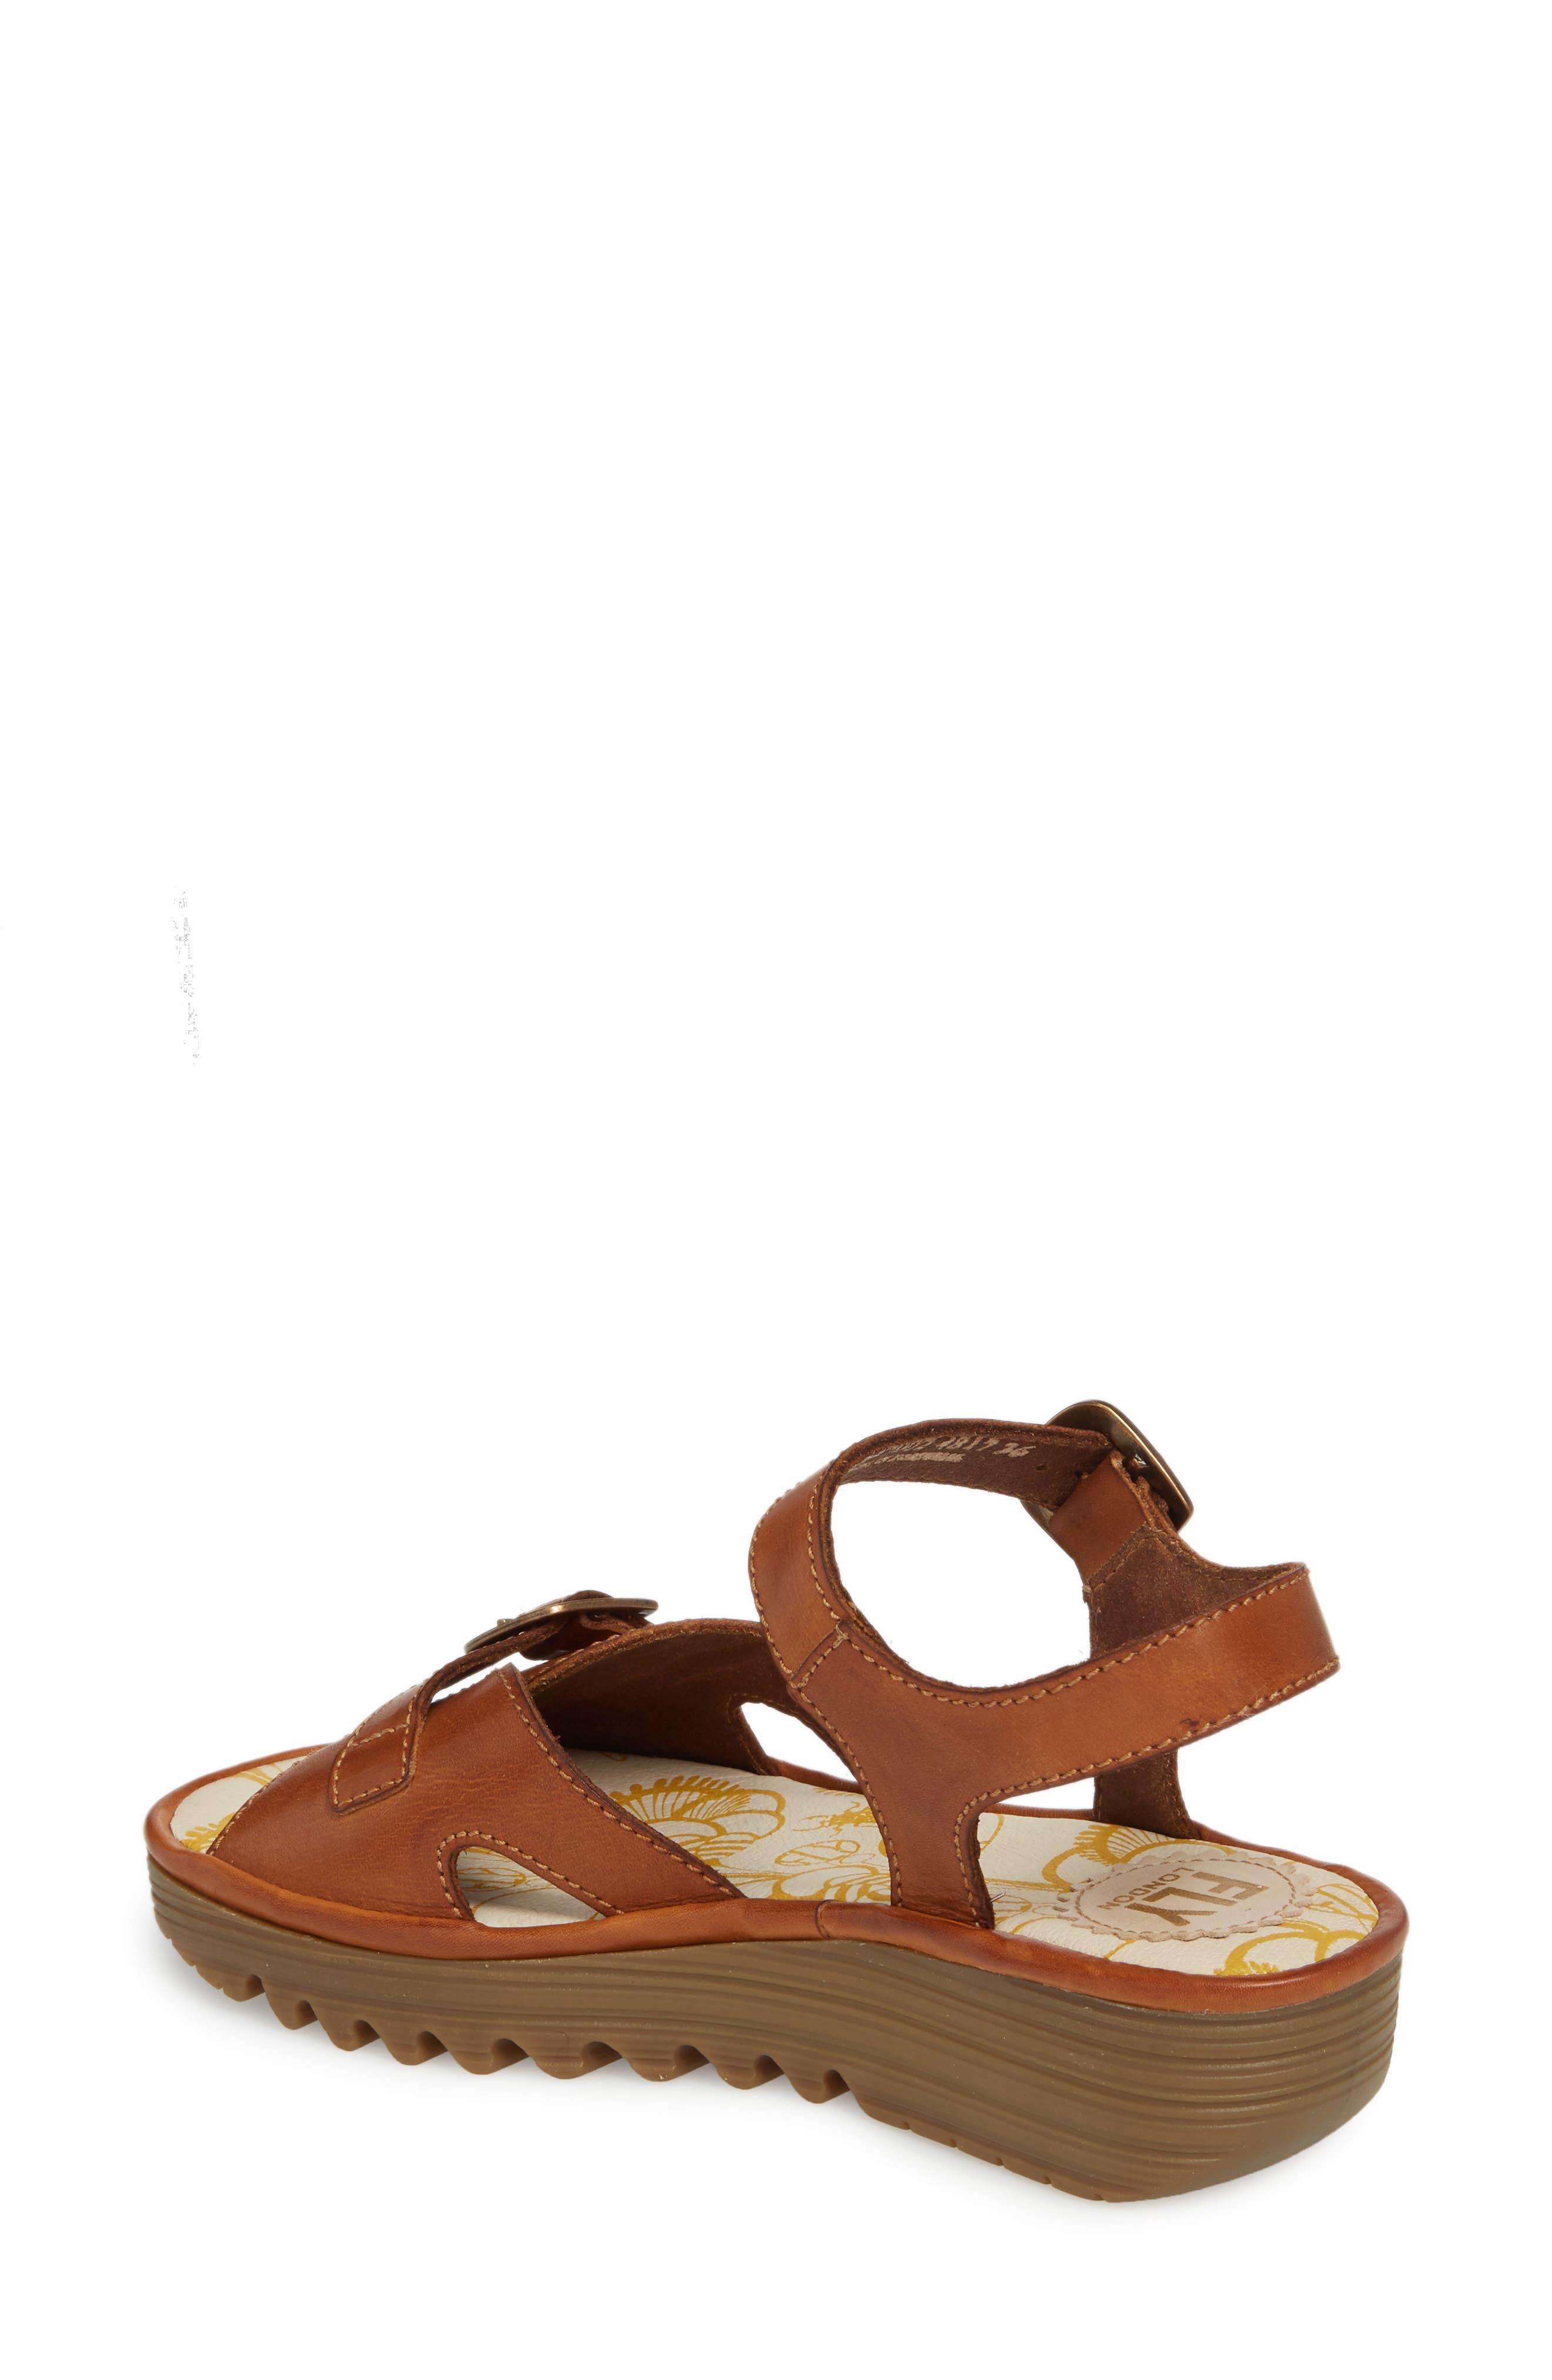 Egal Sandal,                             Alternate thumbnail 2, color,                             Tan Colmar Leather